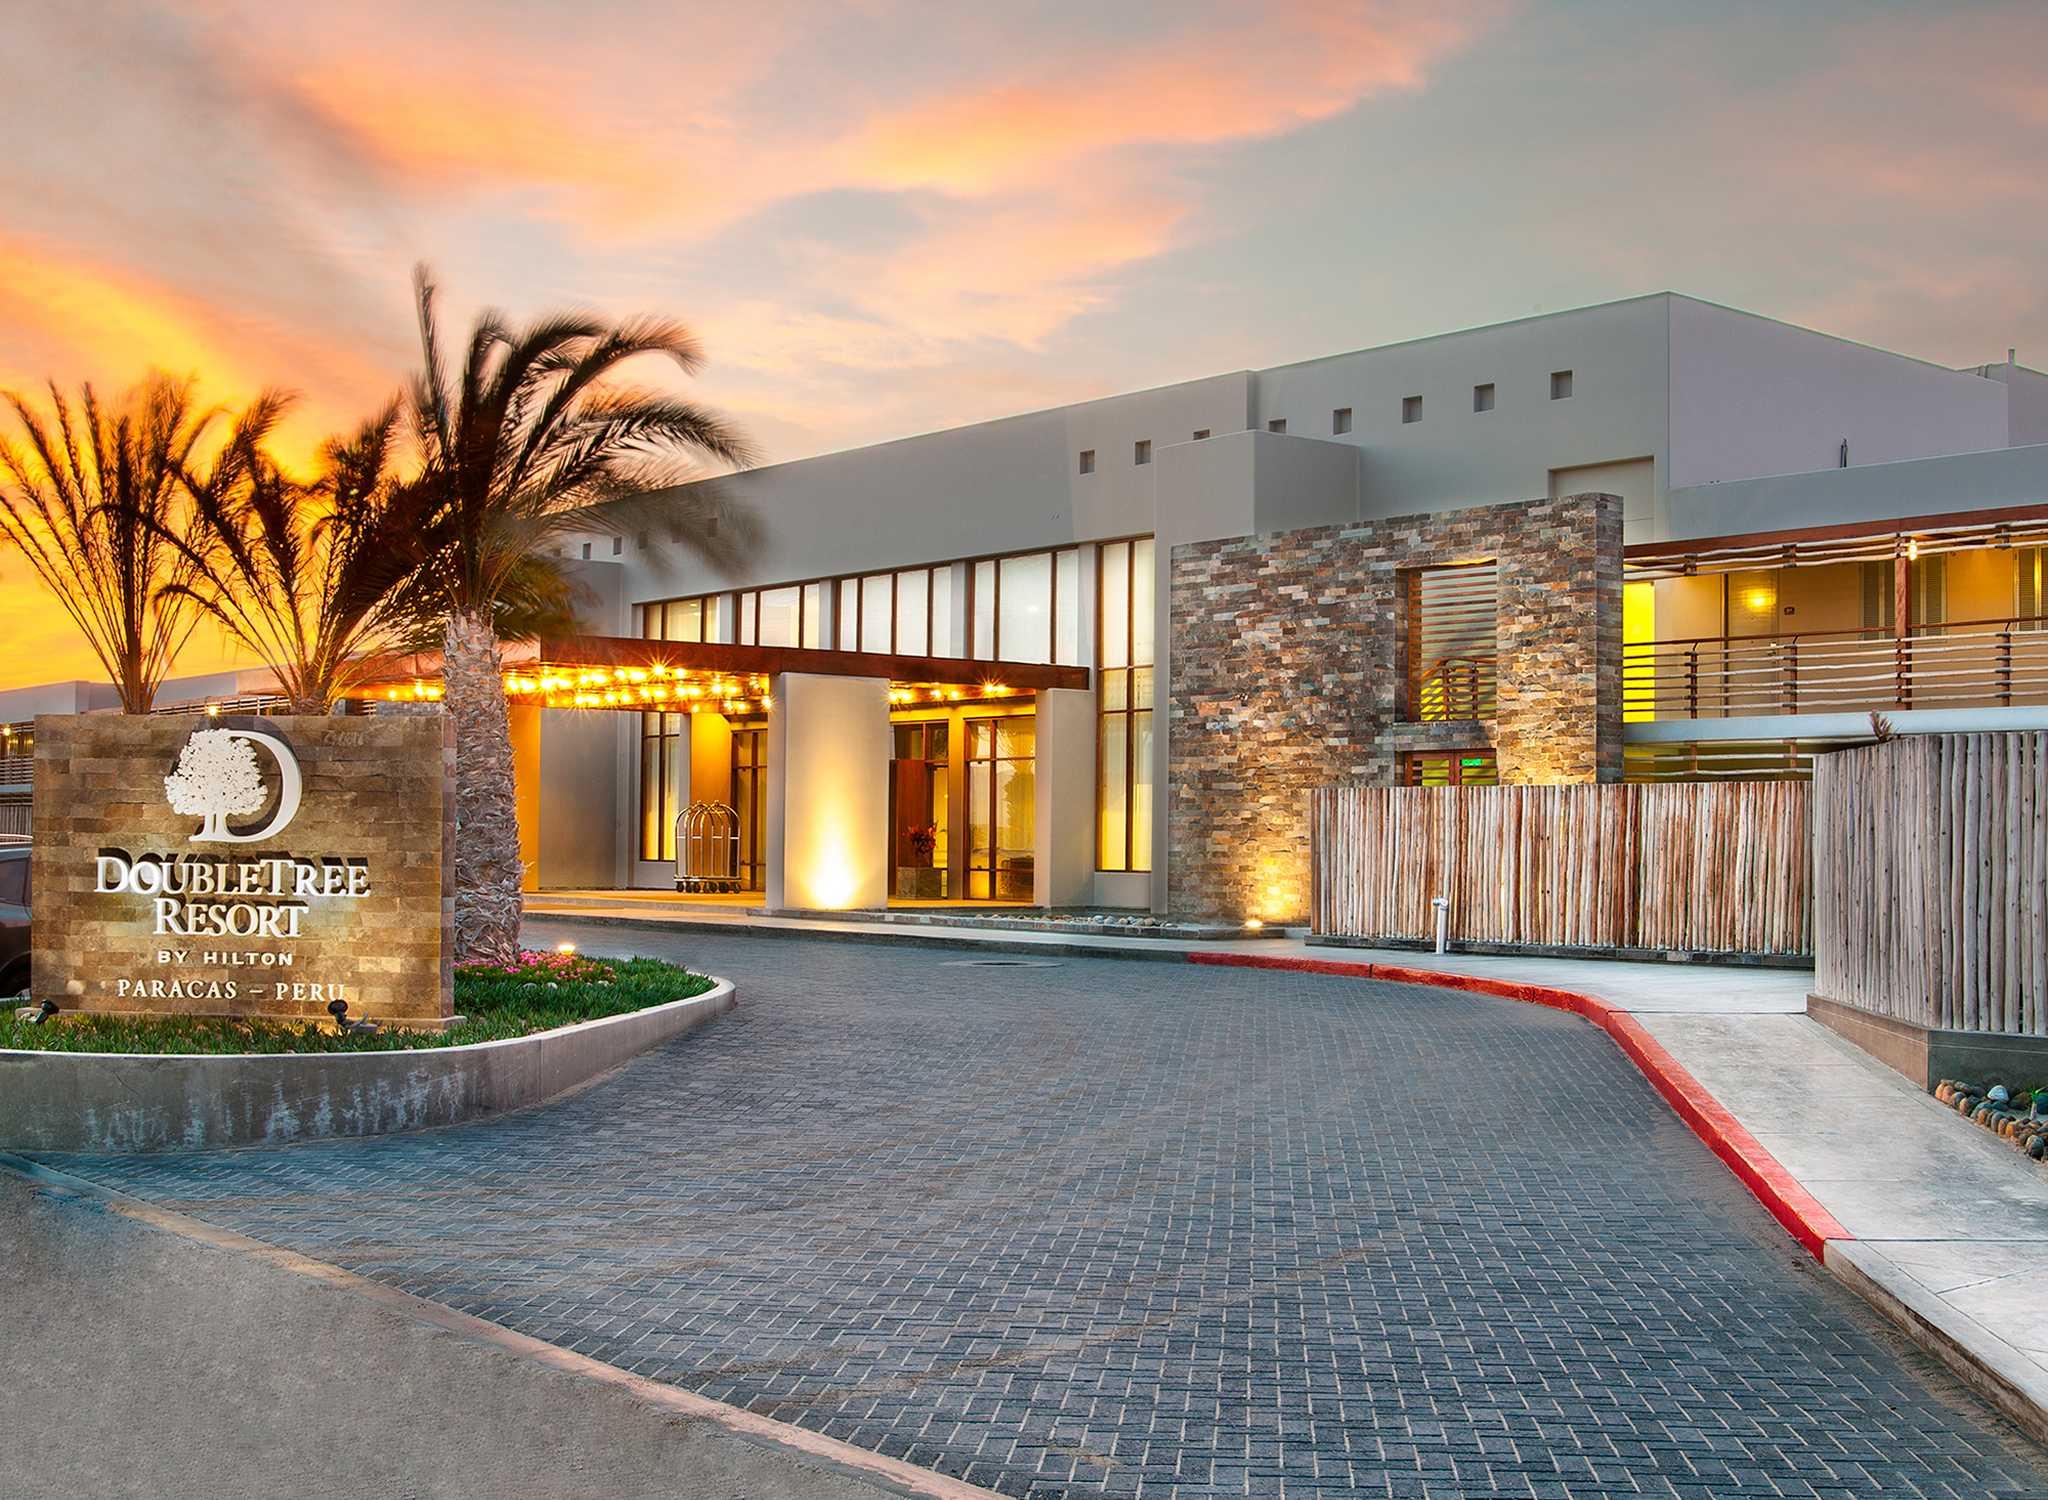 Hotel en per lima paracas hilton for Hotel luxury resort paracas